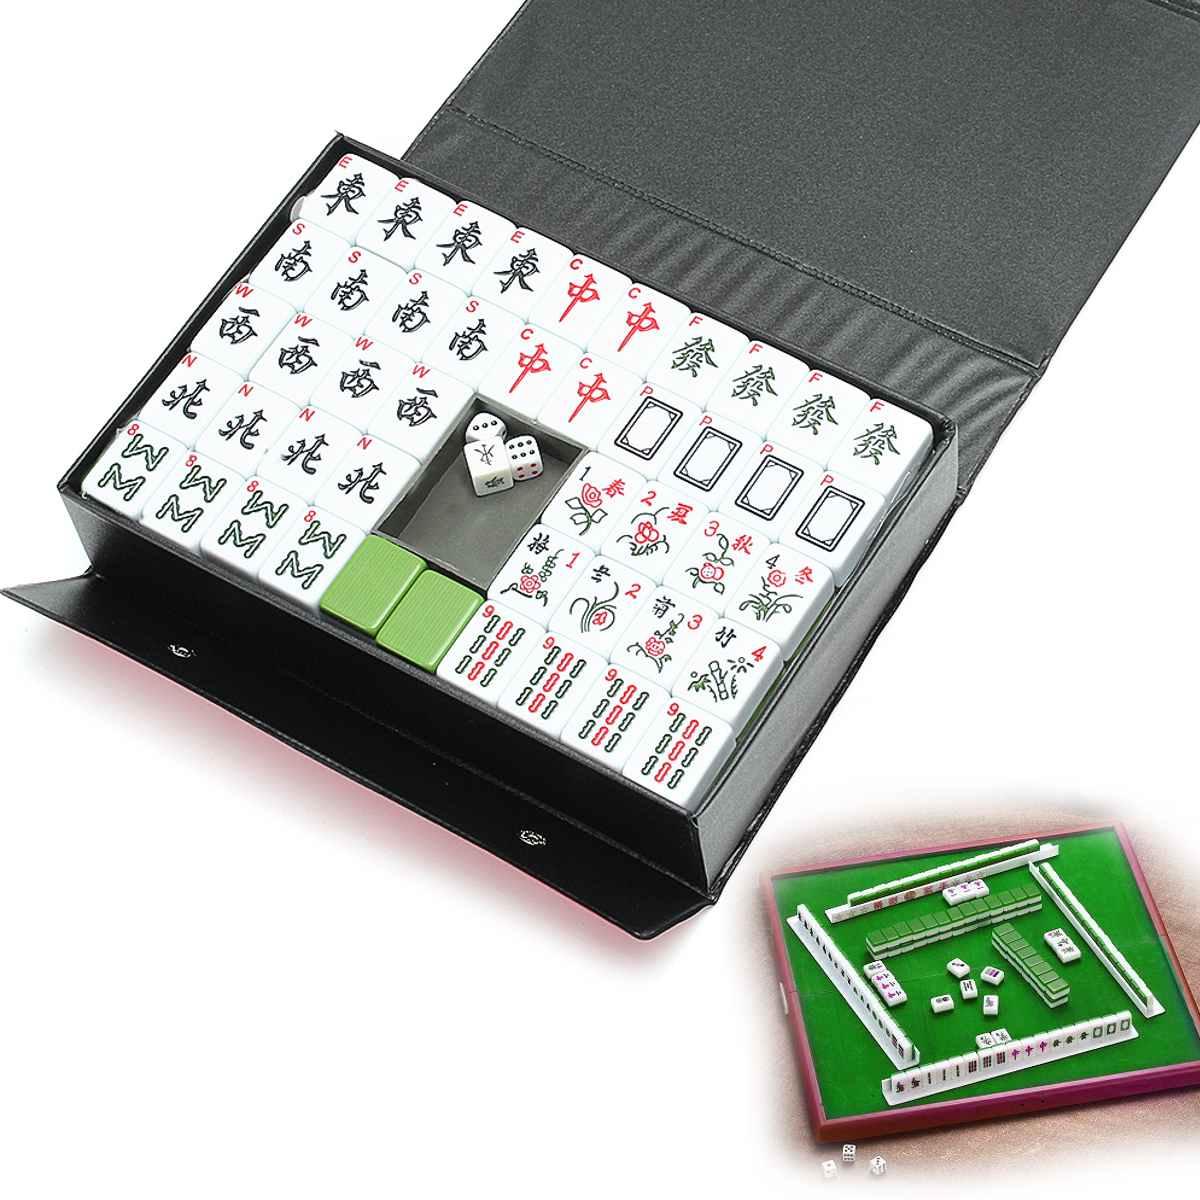 144 Tiles Portable Chinese MahJong Rare Game Set Retro MahJong + Custom Fit Box Entertainment Board Game MahJong Fun Family Game